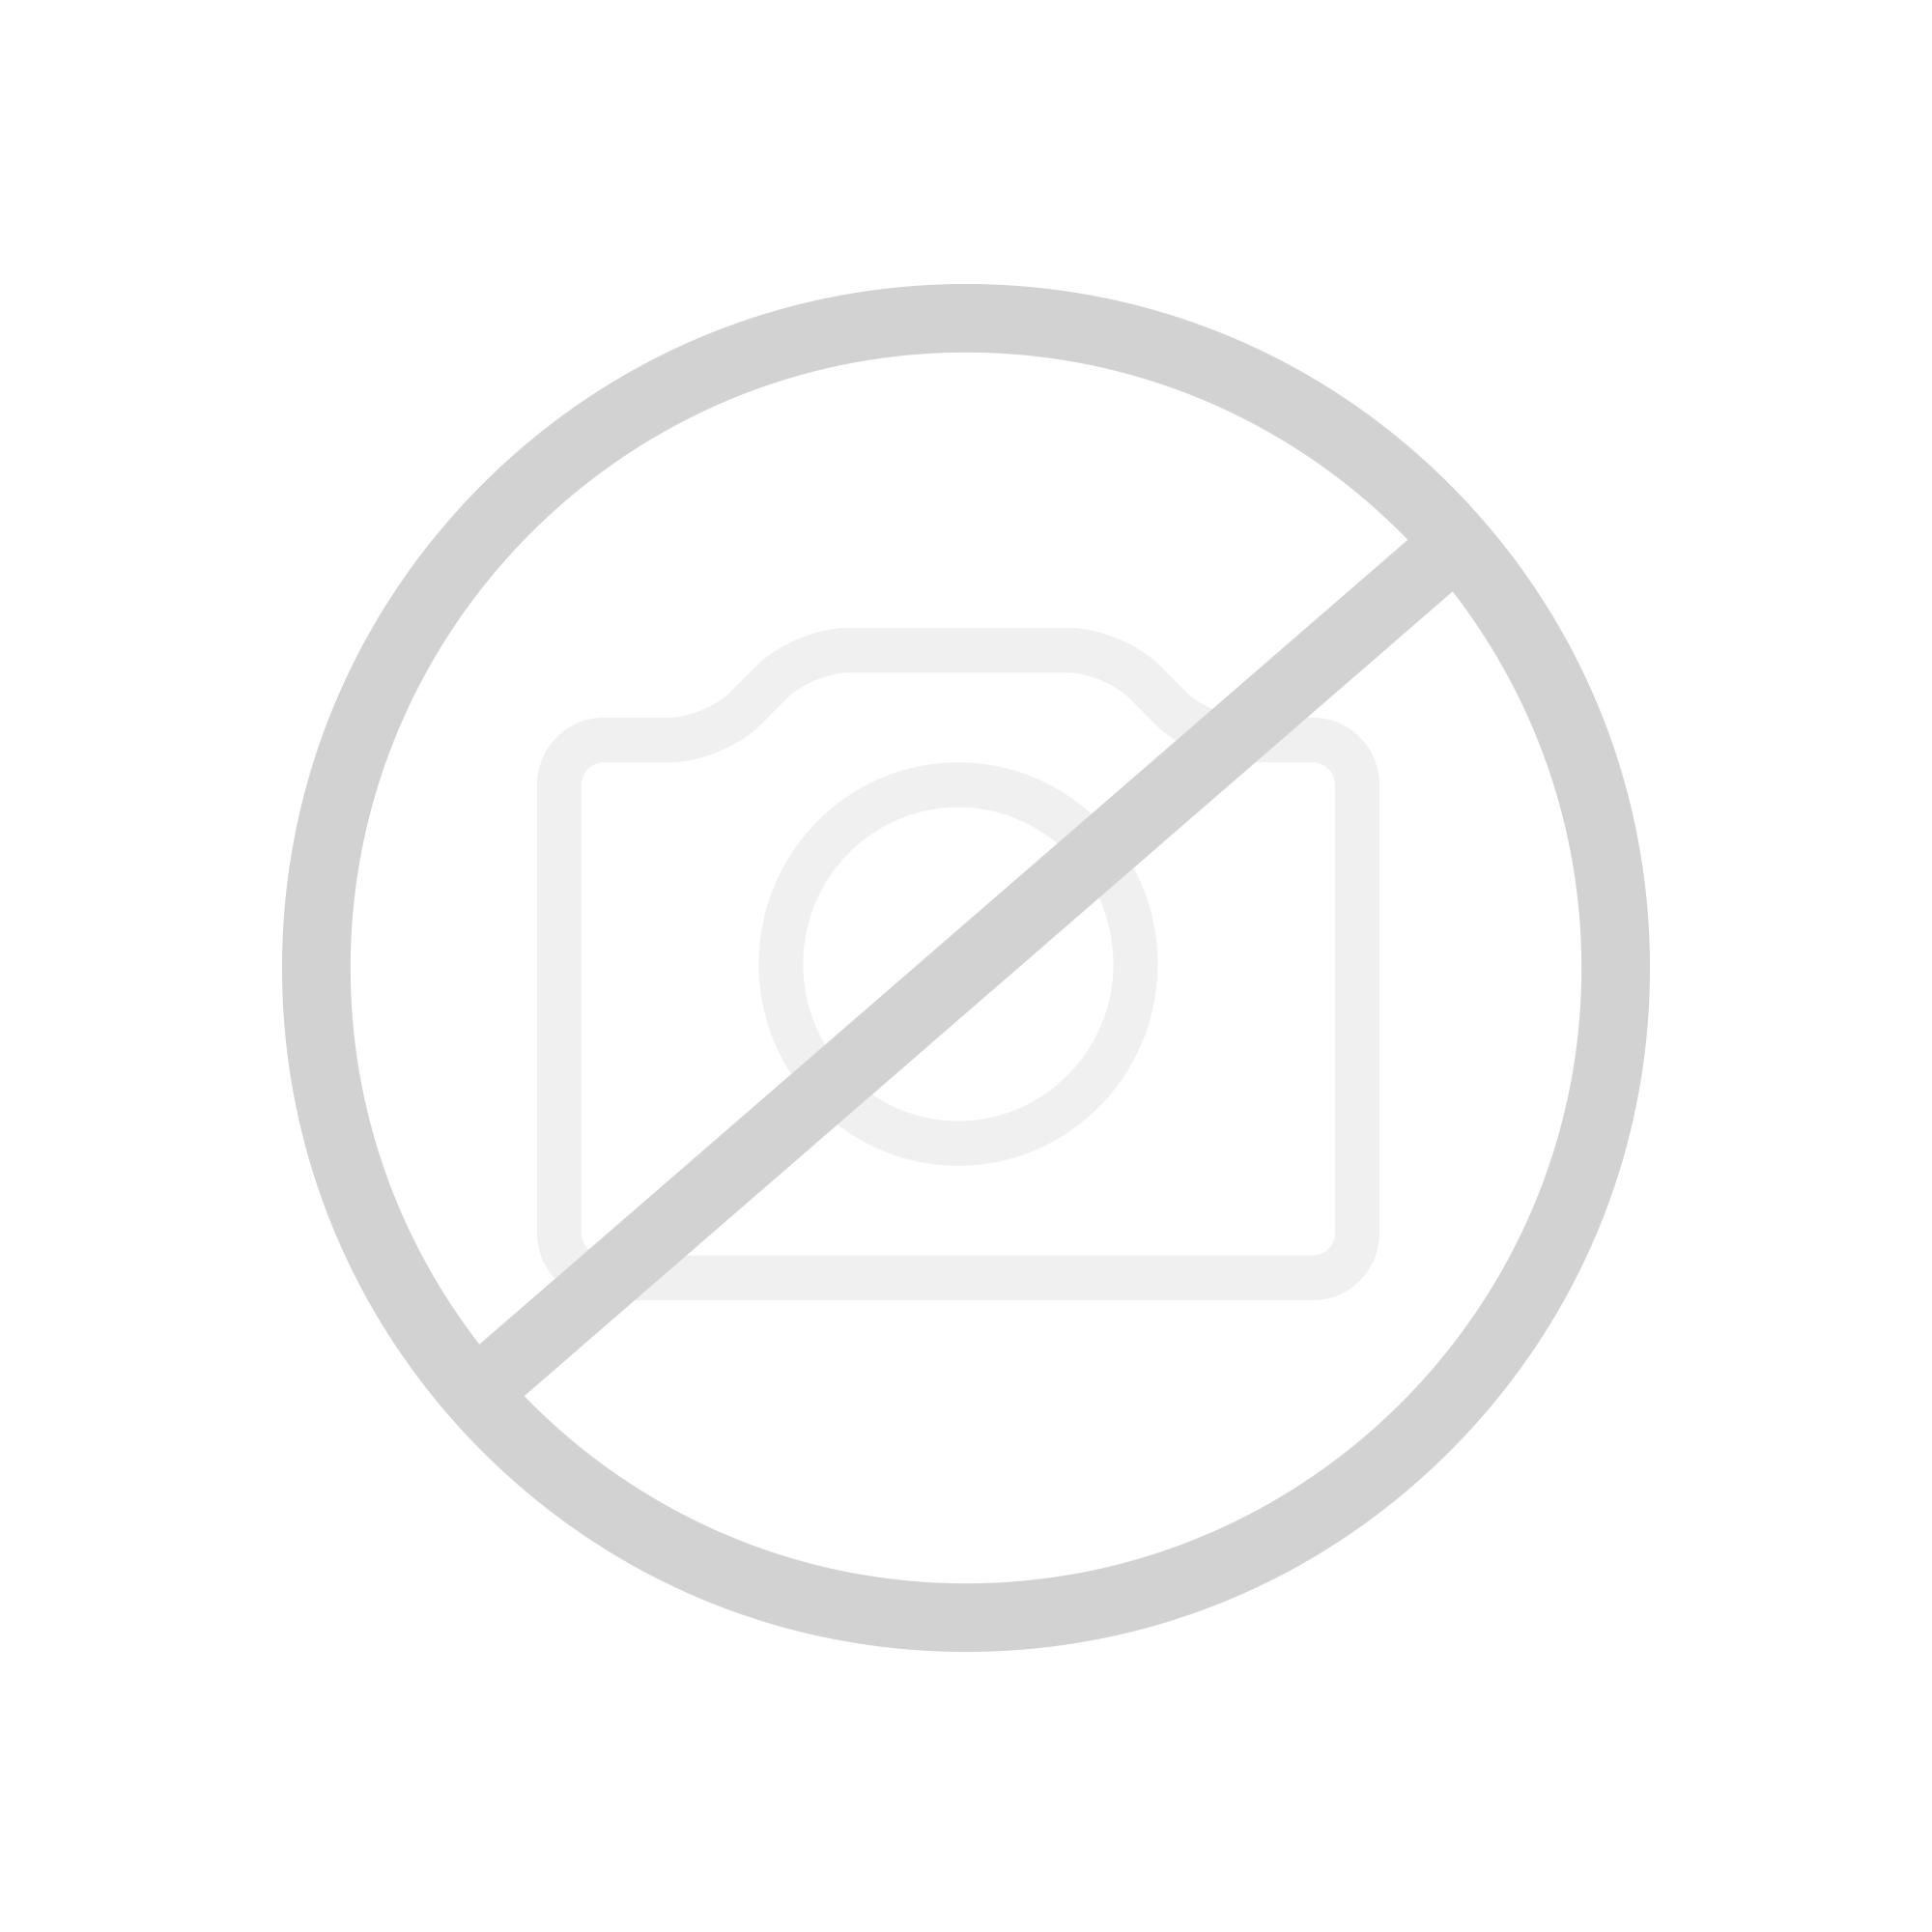 keuco ilook move kosmetikspiegel unterputz netzteil led beleuchtung 17613019003 reuter. Black Bedroom Furniture Sets. Home Design Ideas